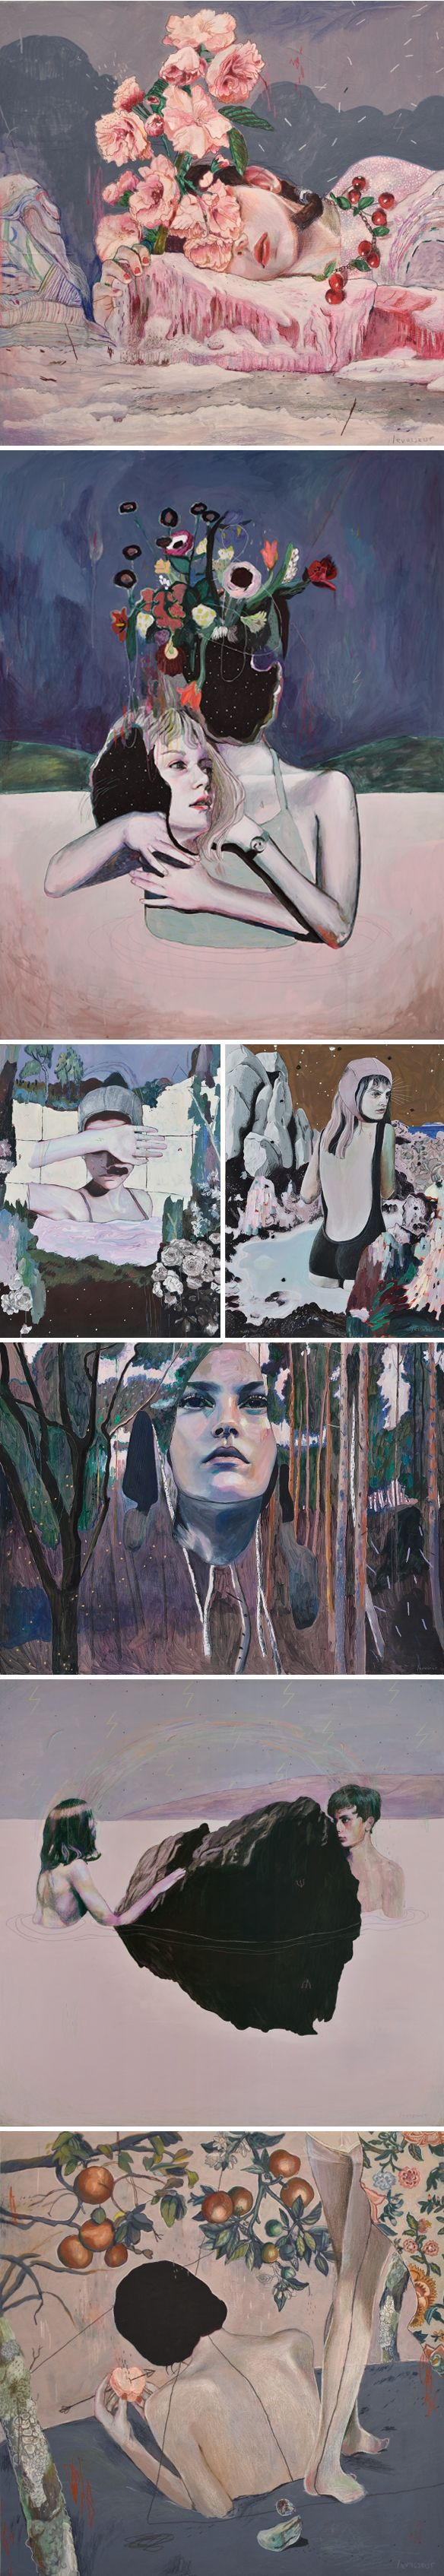 alexandra levasseur | The Jealous Curator | Bloglovin'